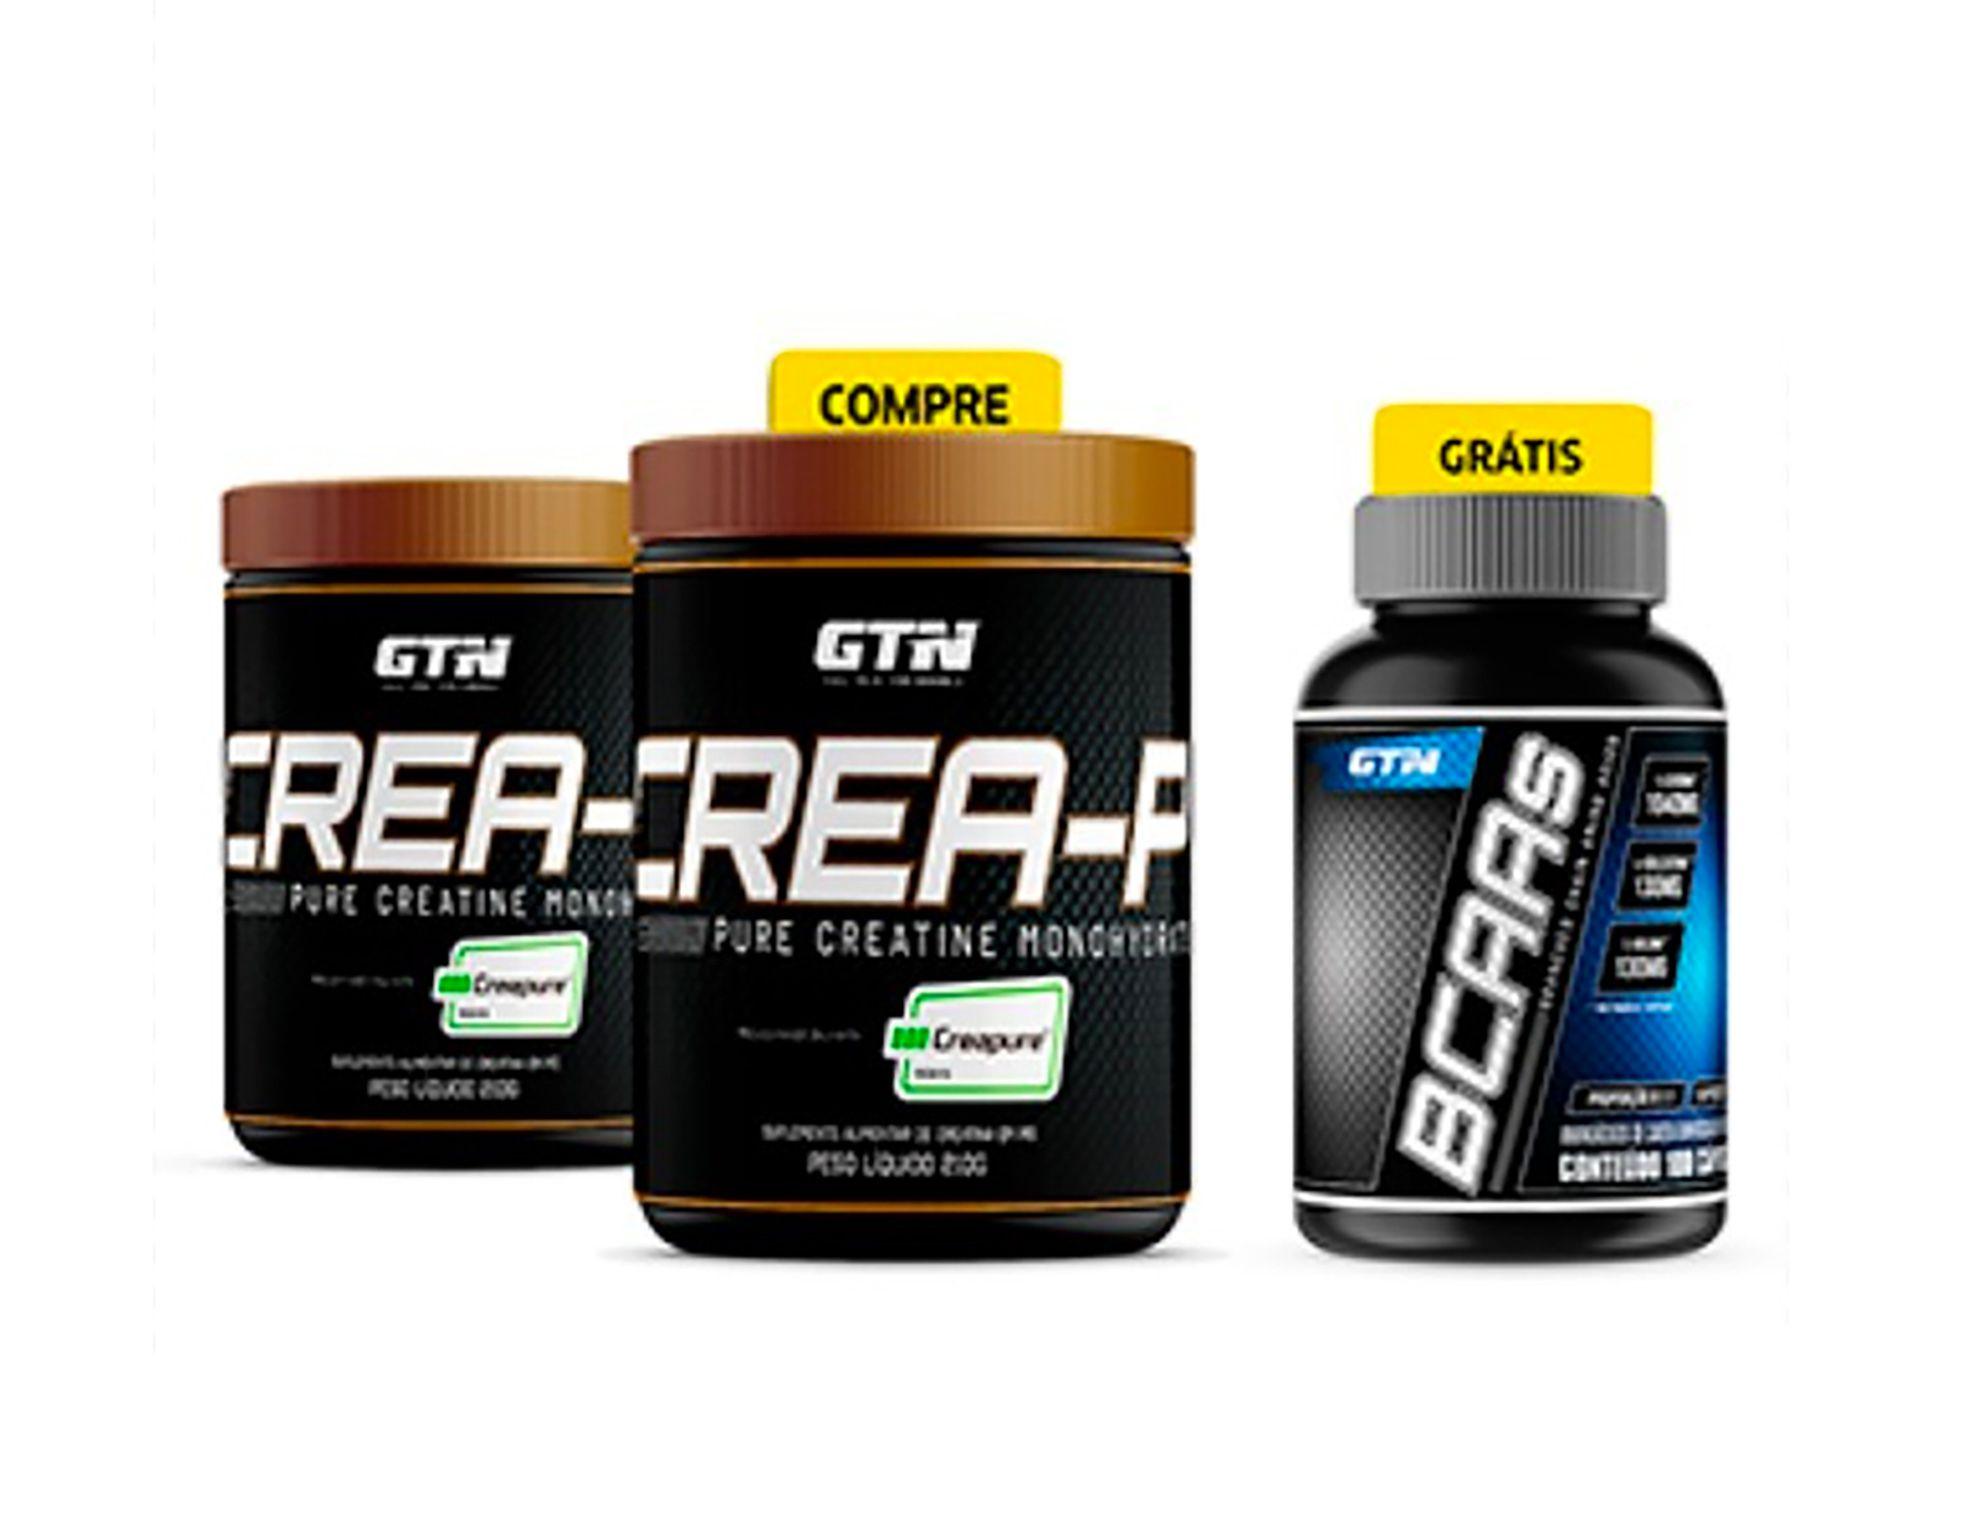 COMPRE E GANHE: Crea-P Creatina 100% Creapure® - COMBO 2x210g + BCAA 100 Capsulas GRÁTIS!